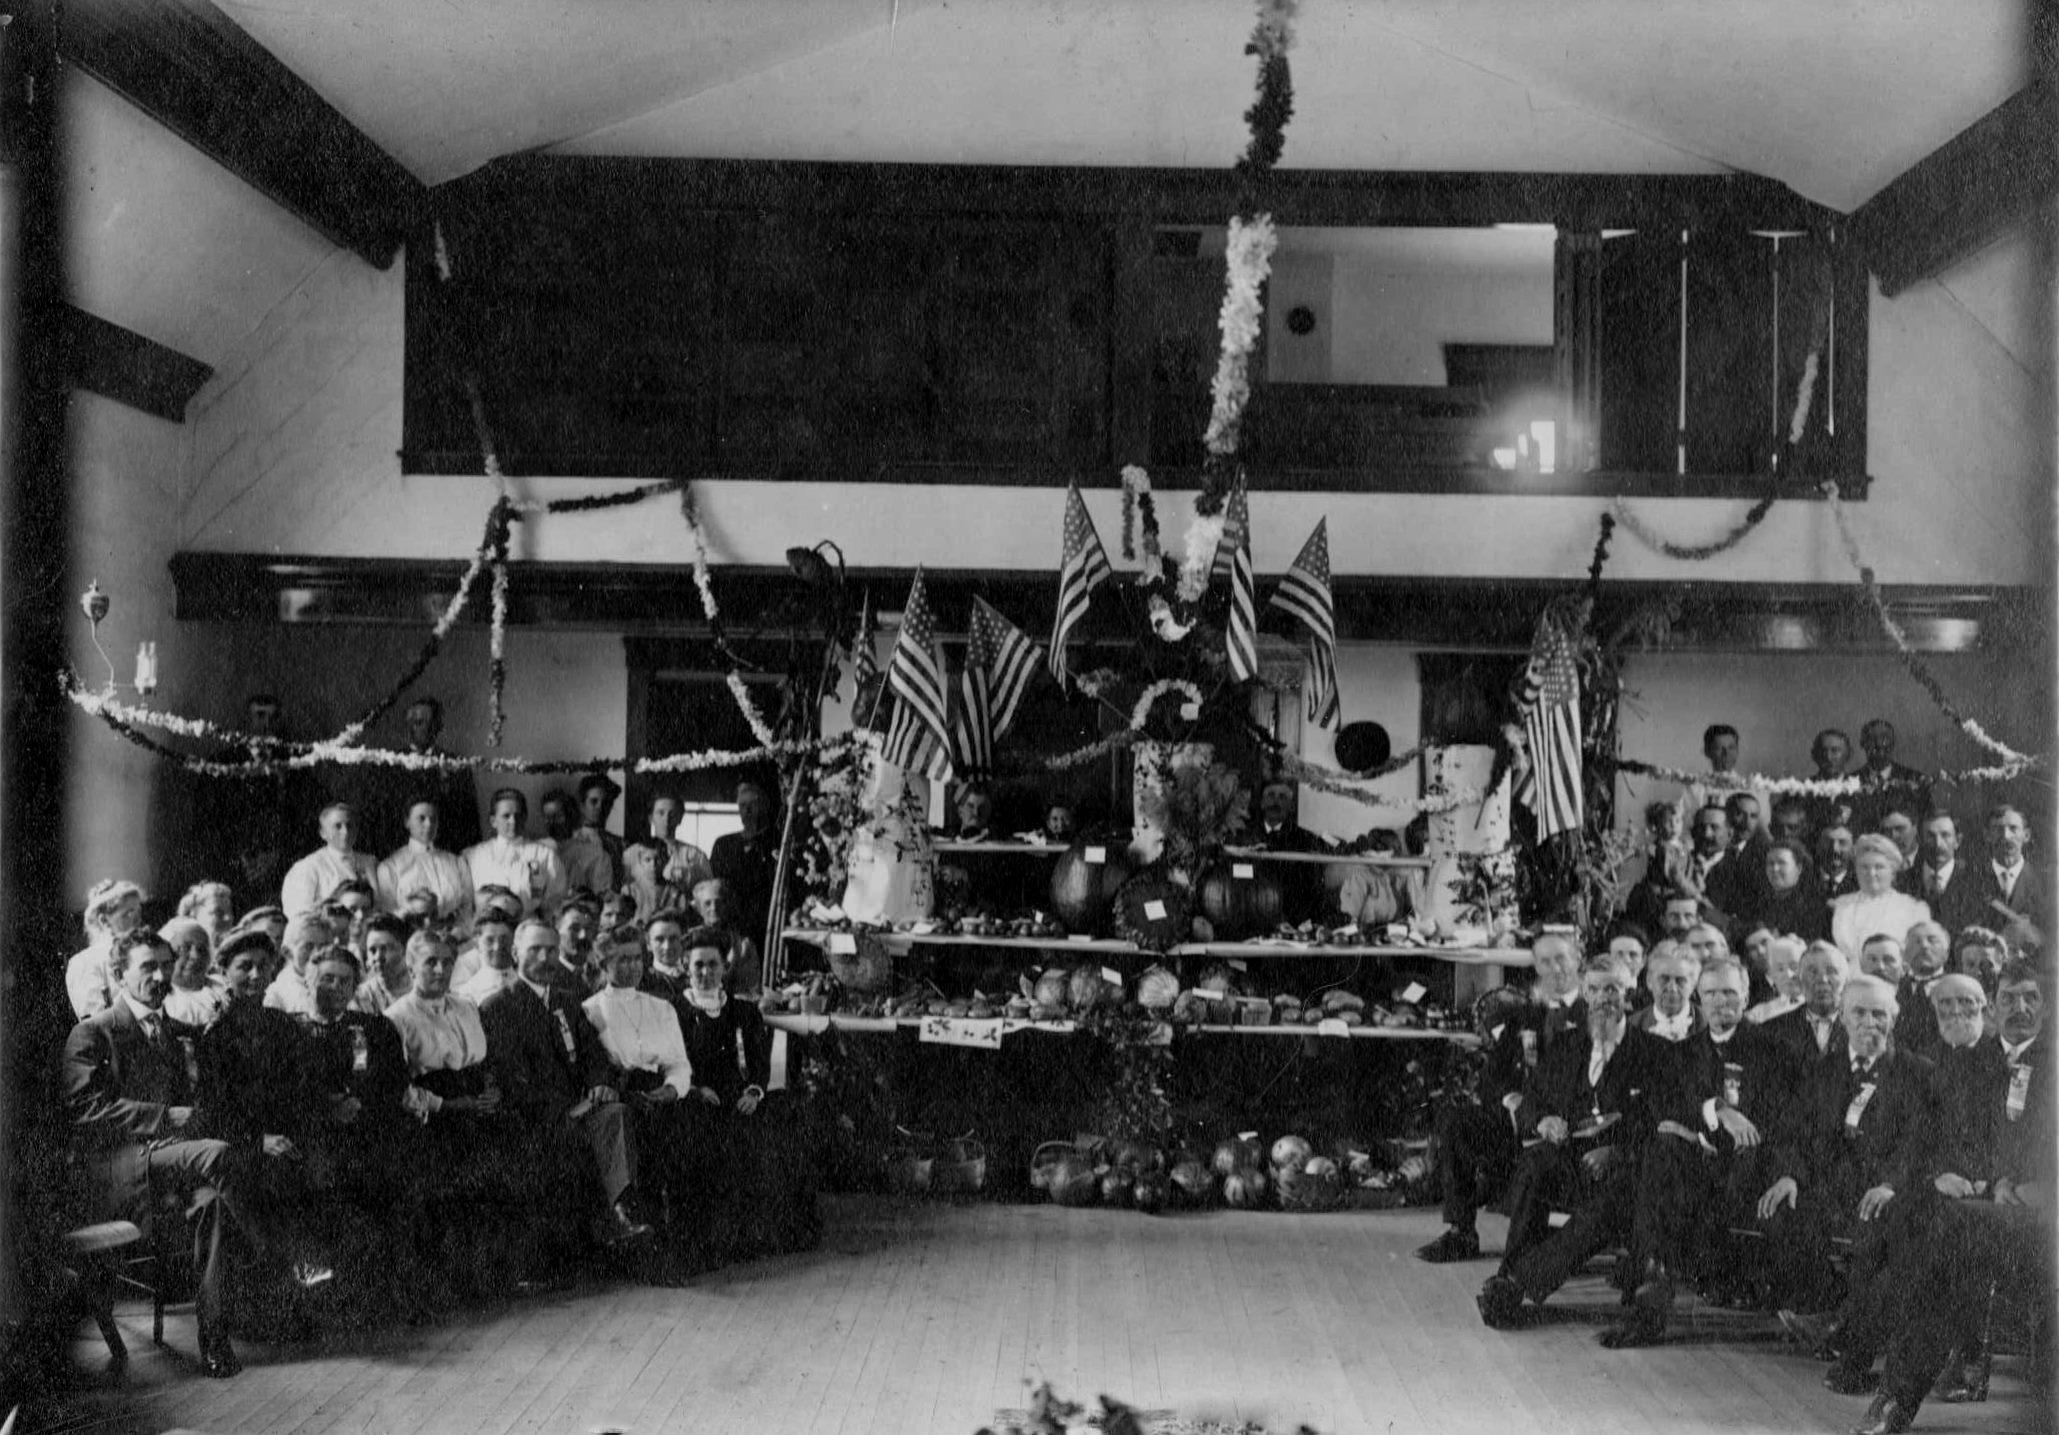 Interior with Wooden Floor during Grange Fair 1910